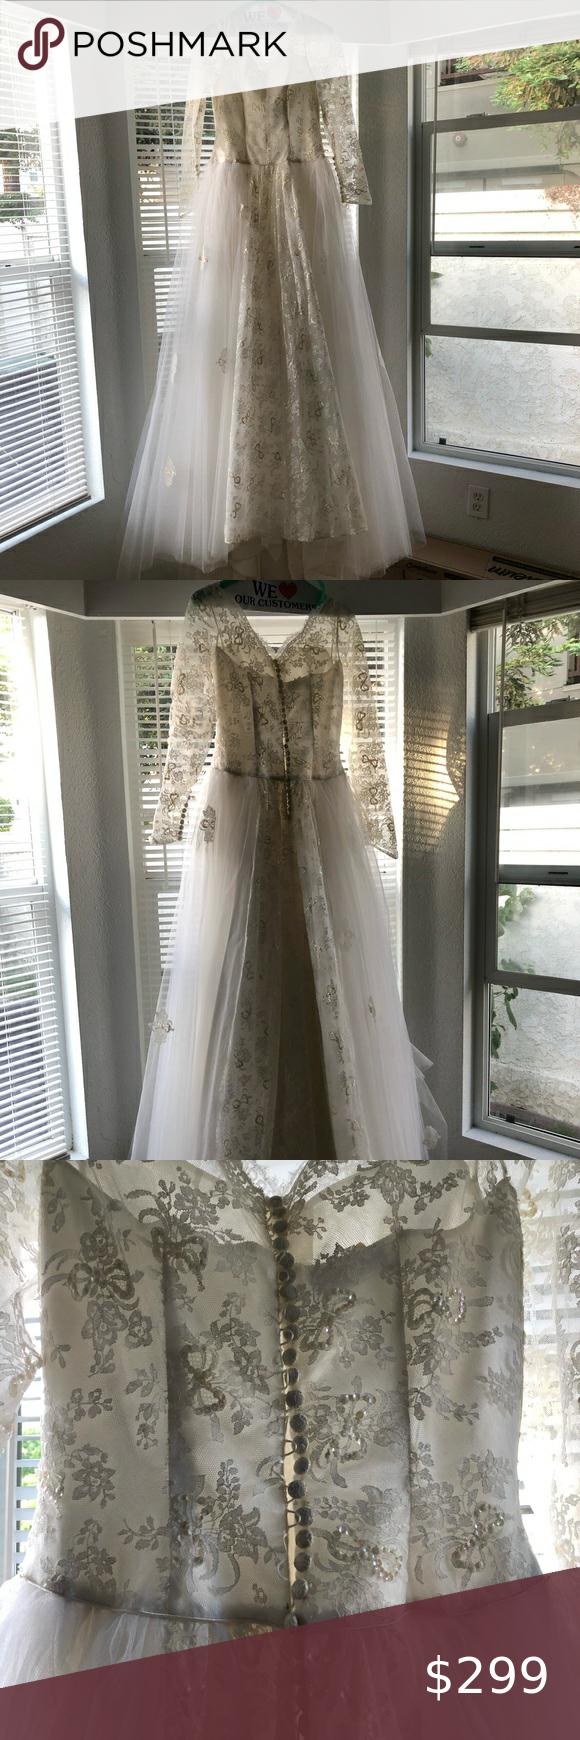 Vintage 1950 S Wedding Dress In 2020 Wedding Dresses Wedding 1950s Wedding Dress